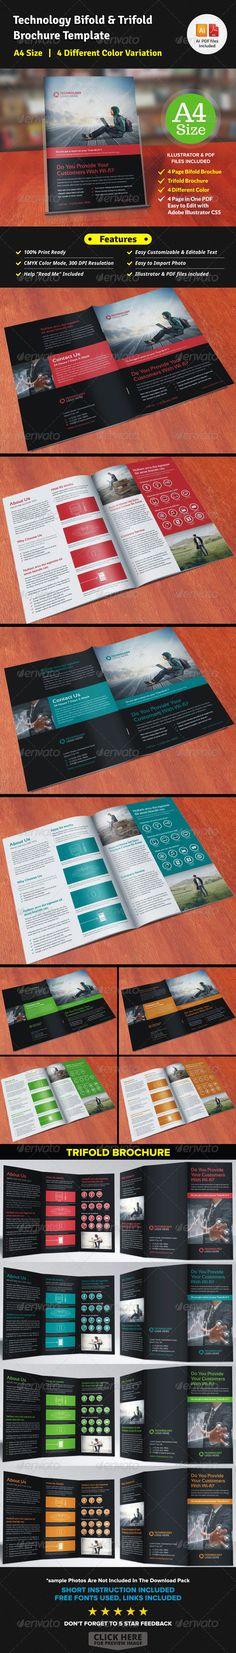 Food Recipes Brochure Catalog Indesign V  Desain Brosur Dan